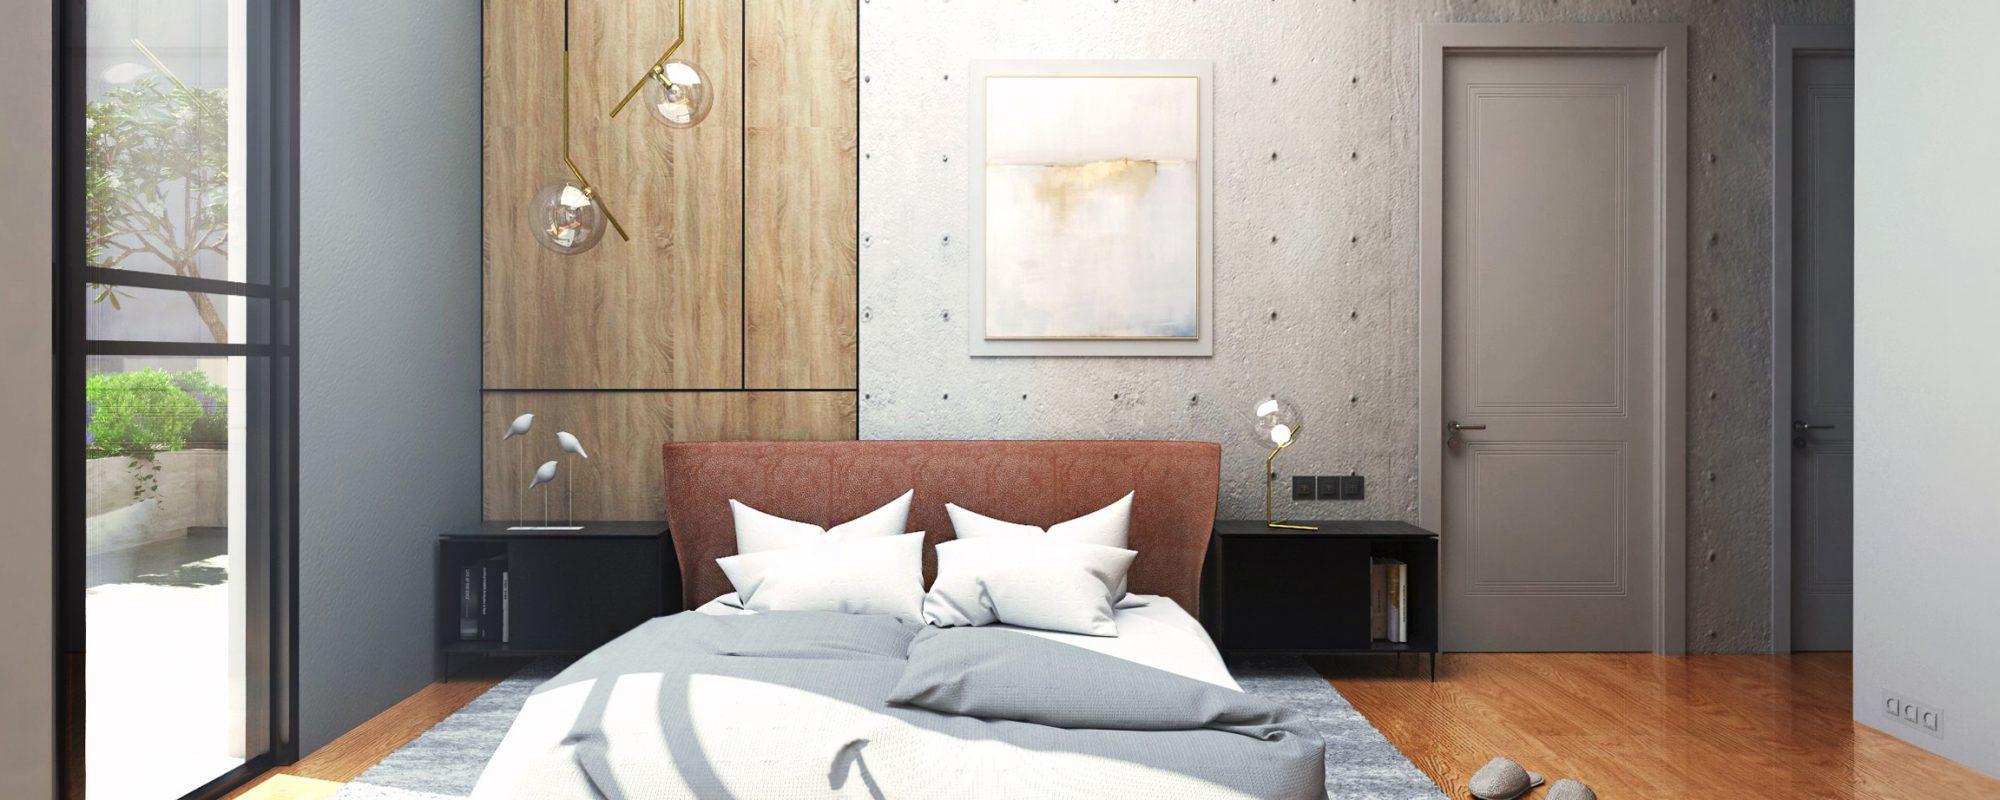 06_master_bedroom